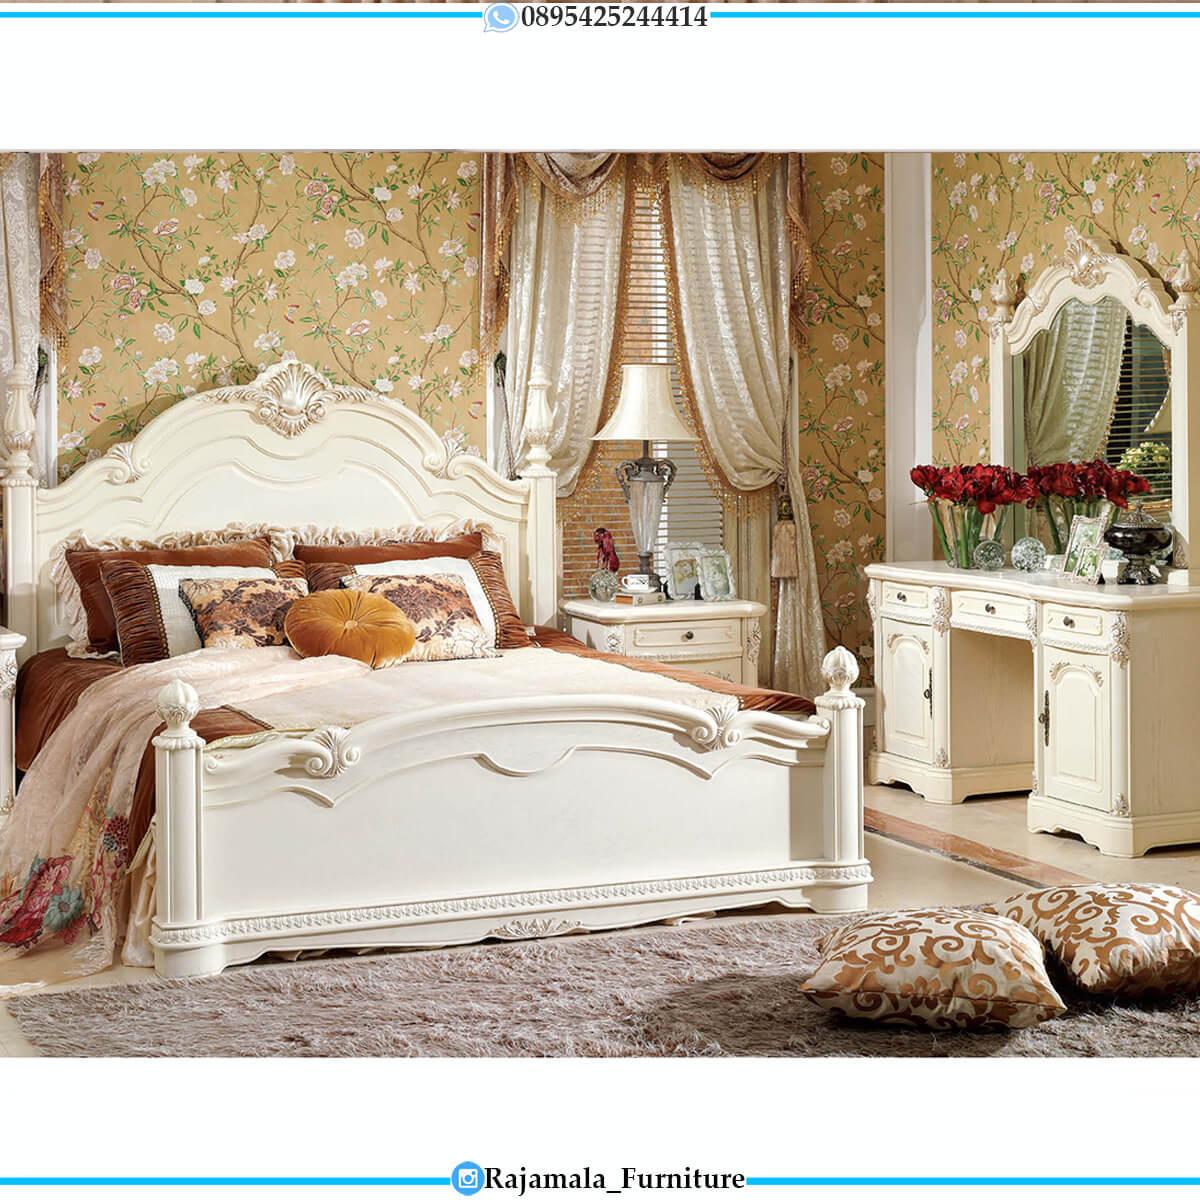 Tempat Tidur Mewah Ukir Jepara Luxury Classic Carving Style RM-0650